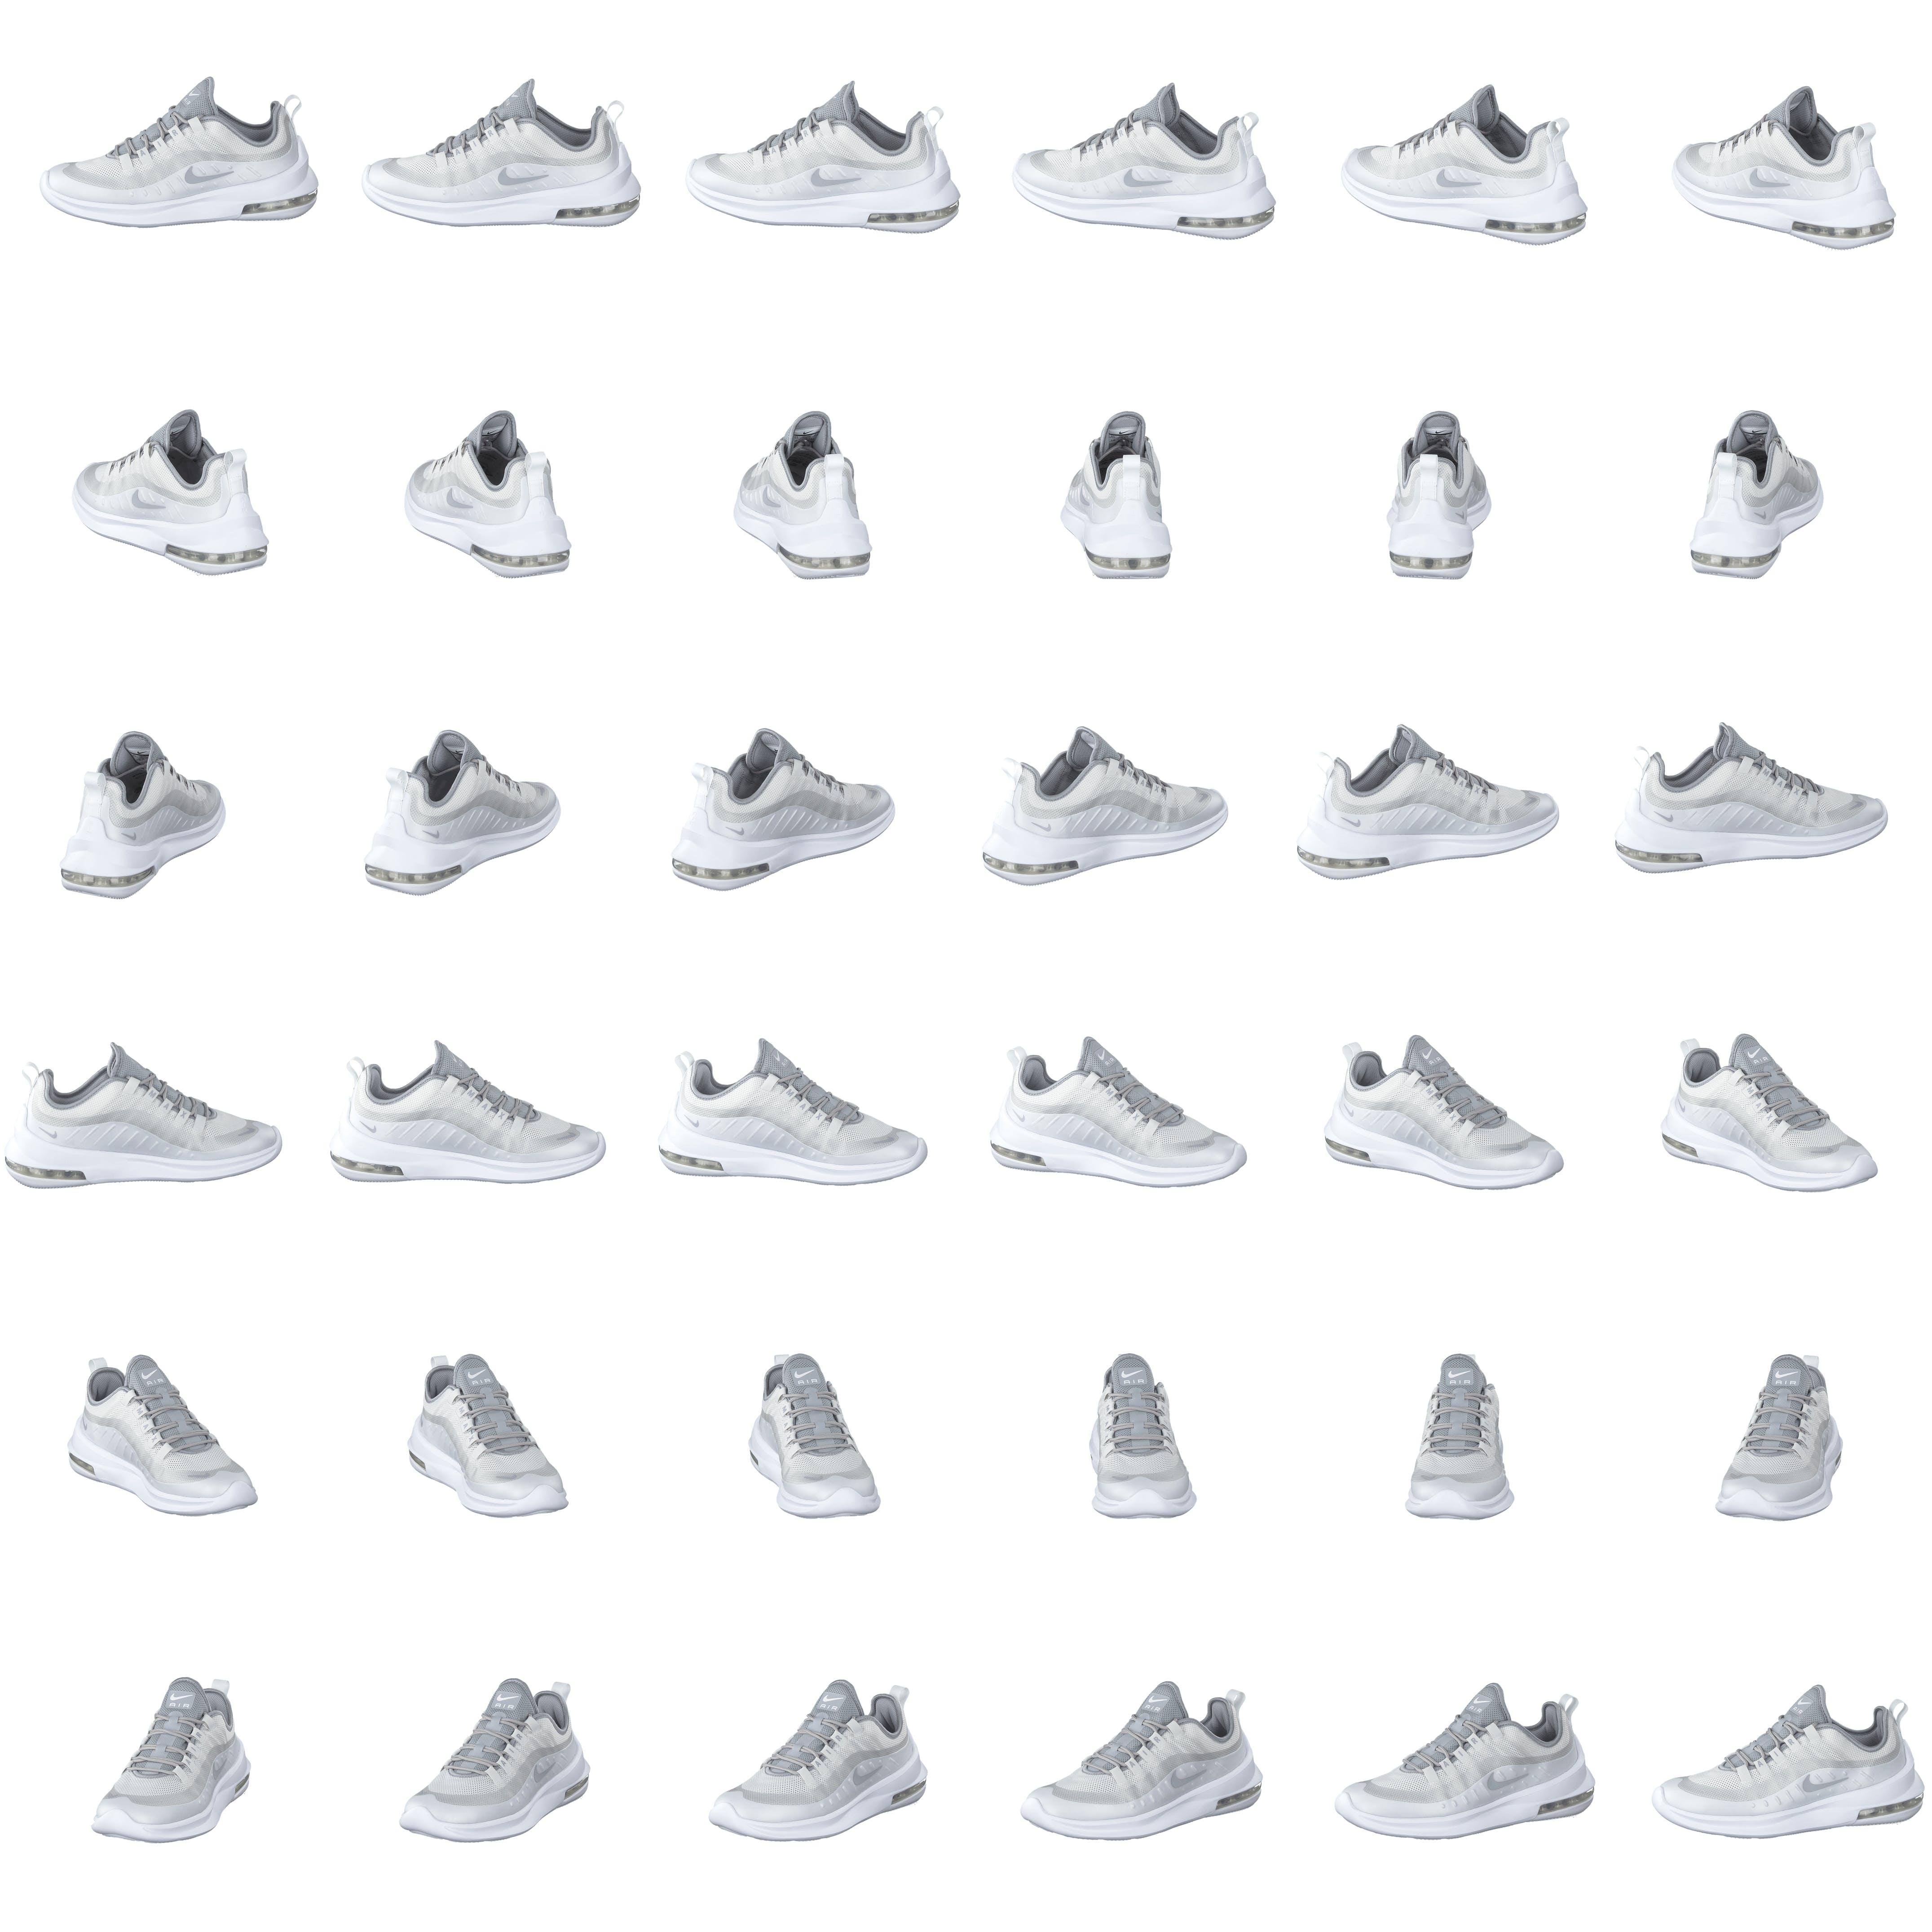 Kup Nike Wmns Air Max Axis Platinum Tintwolf Grey white